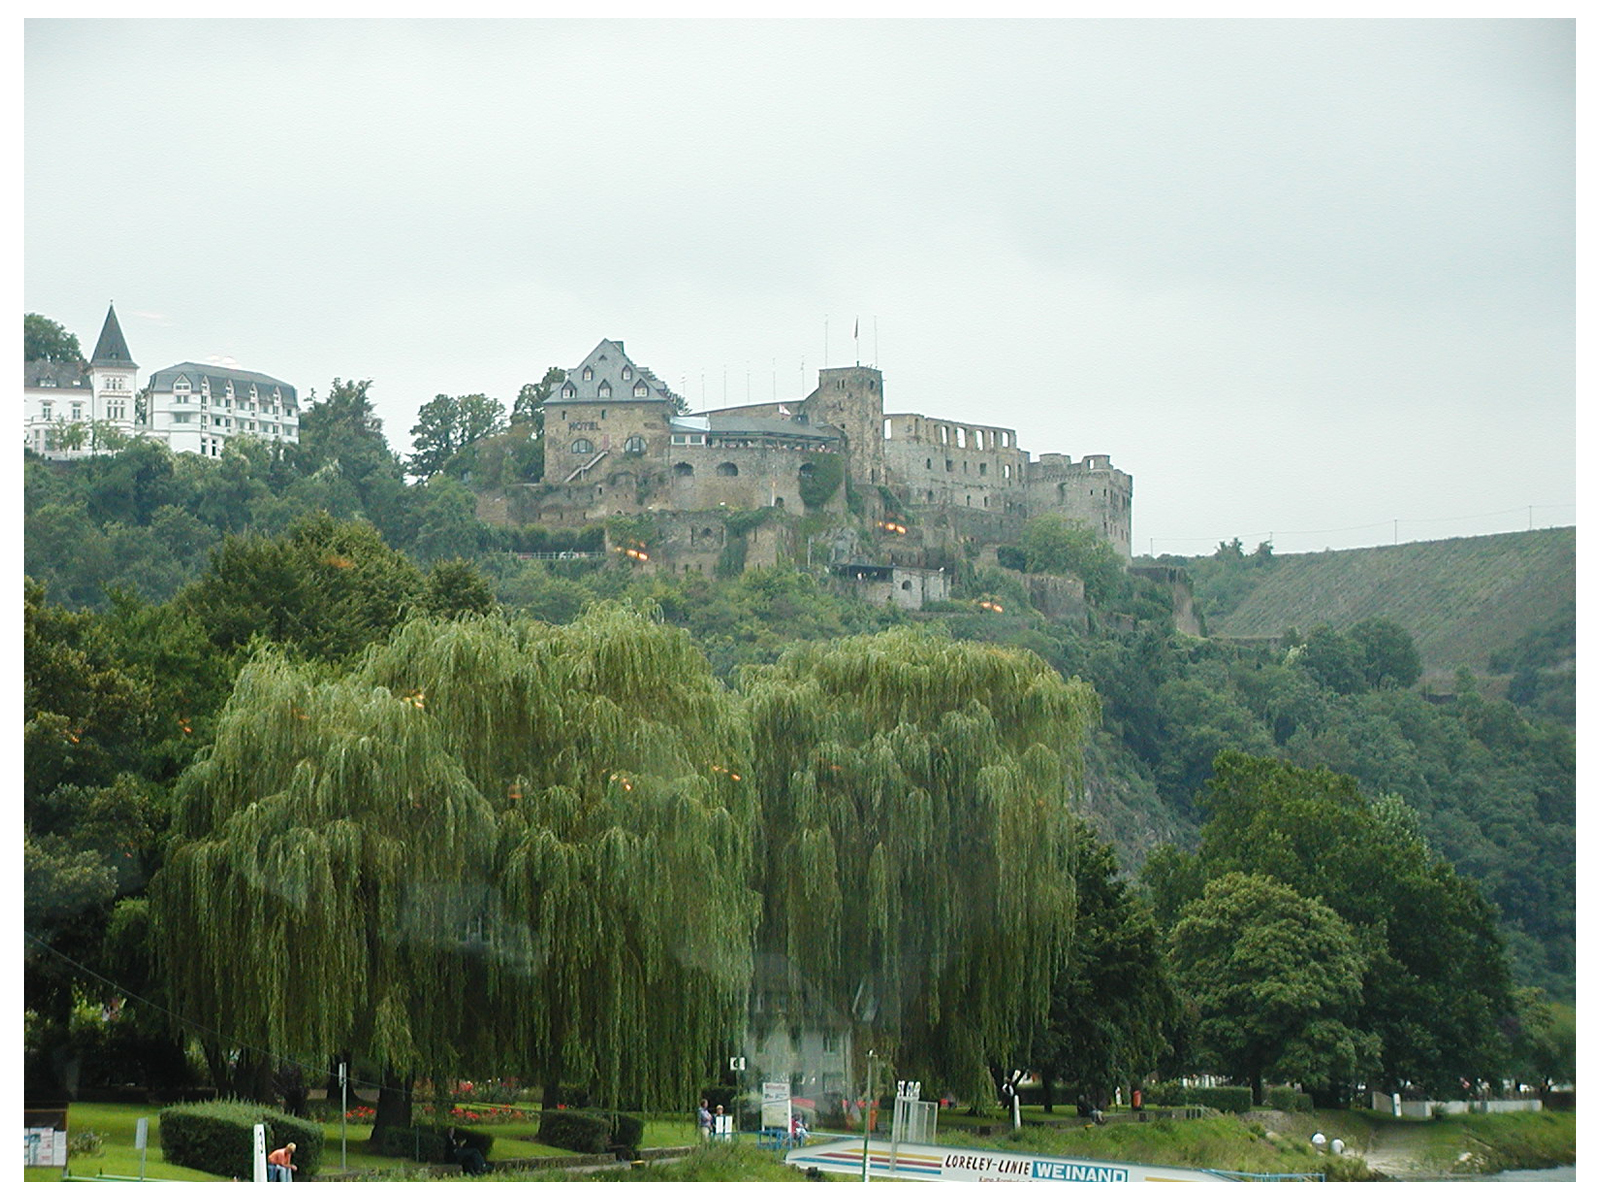 Rhinefels Castle